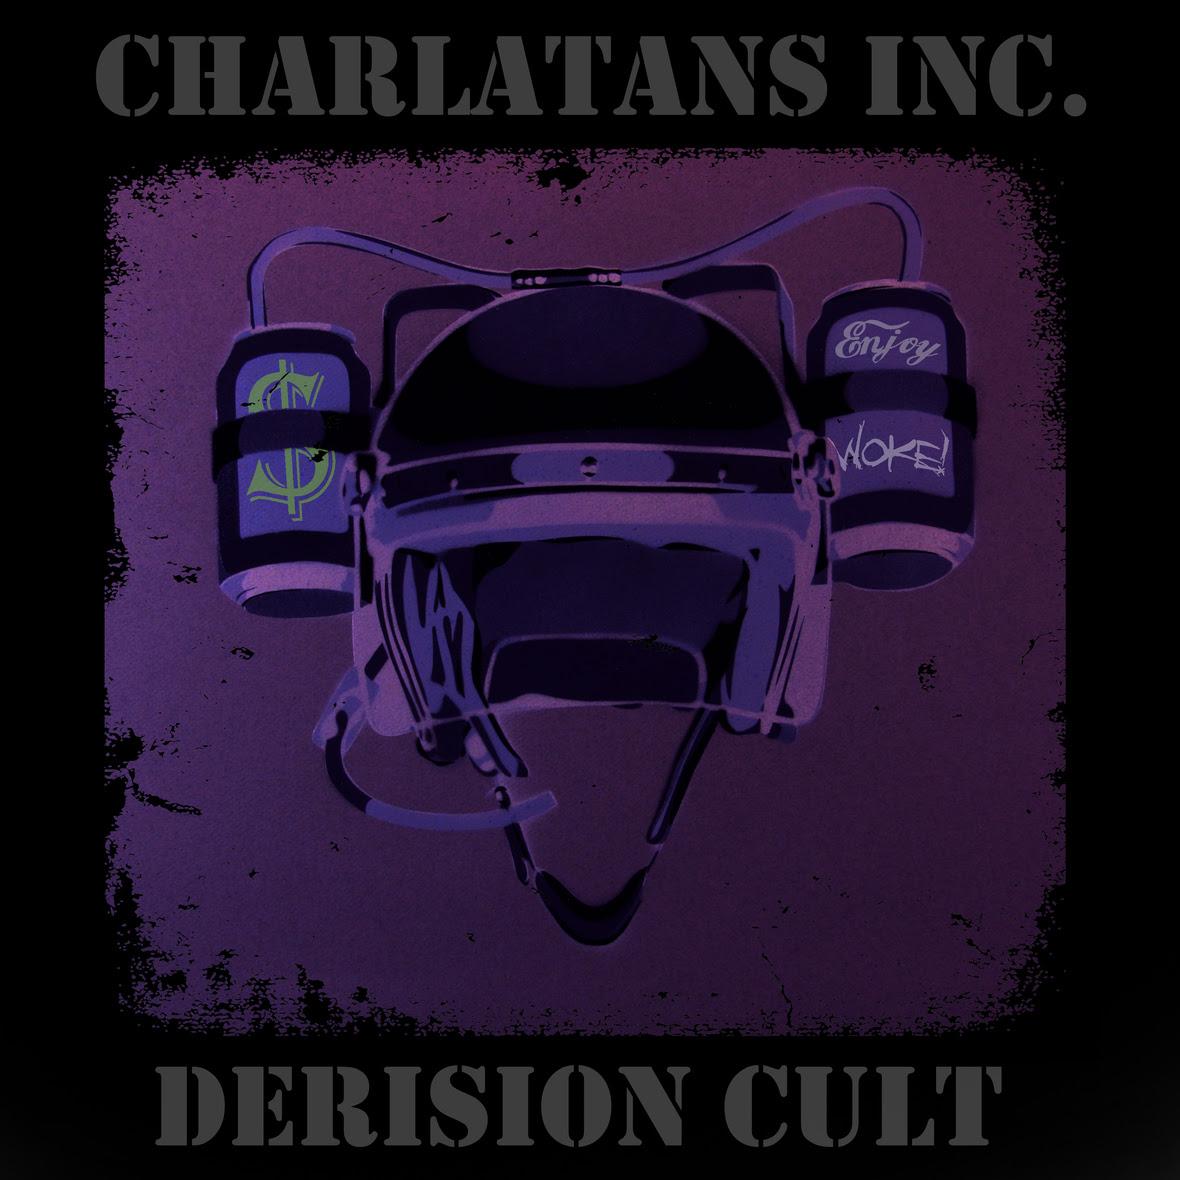 charlatansinc